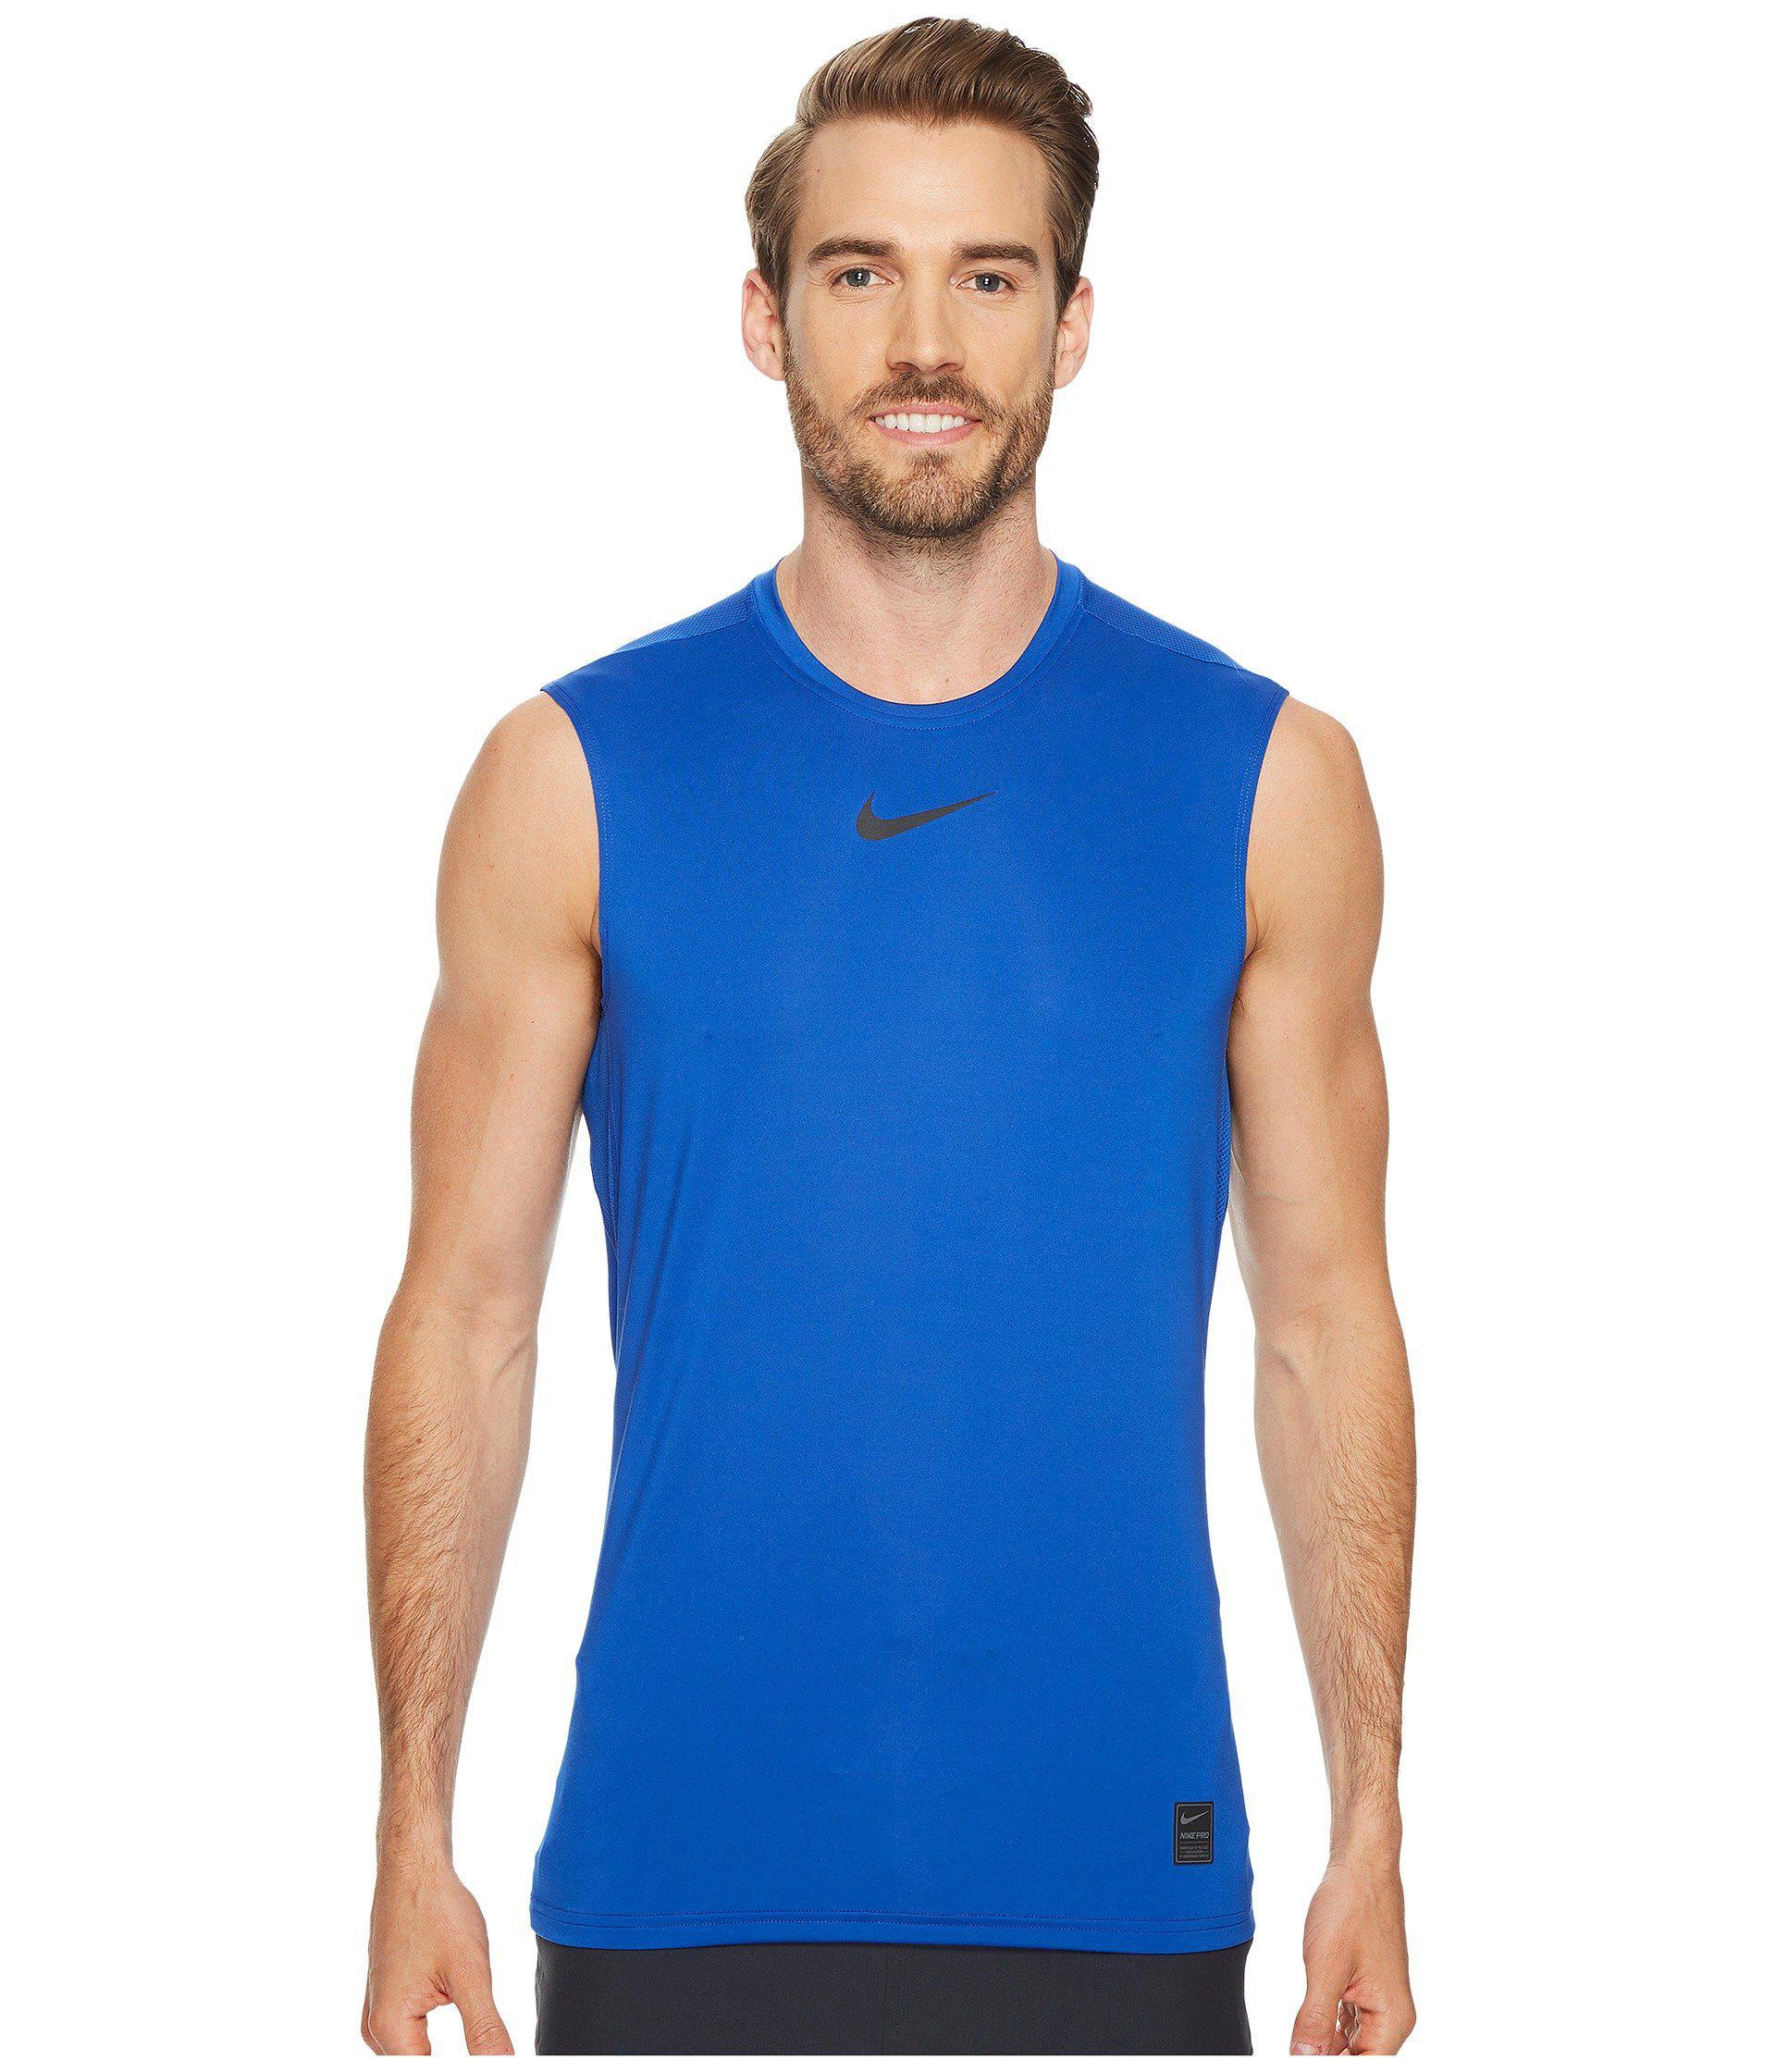 f4636b53e1eb9 Nike - Pro Fitted Sleeveless Training Top (black white white) Men s  Sleeveless. View fullscreen